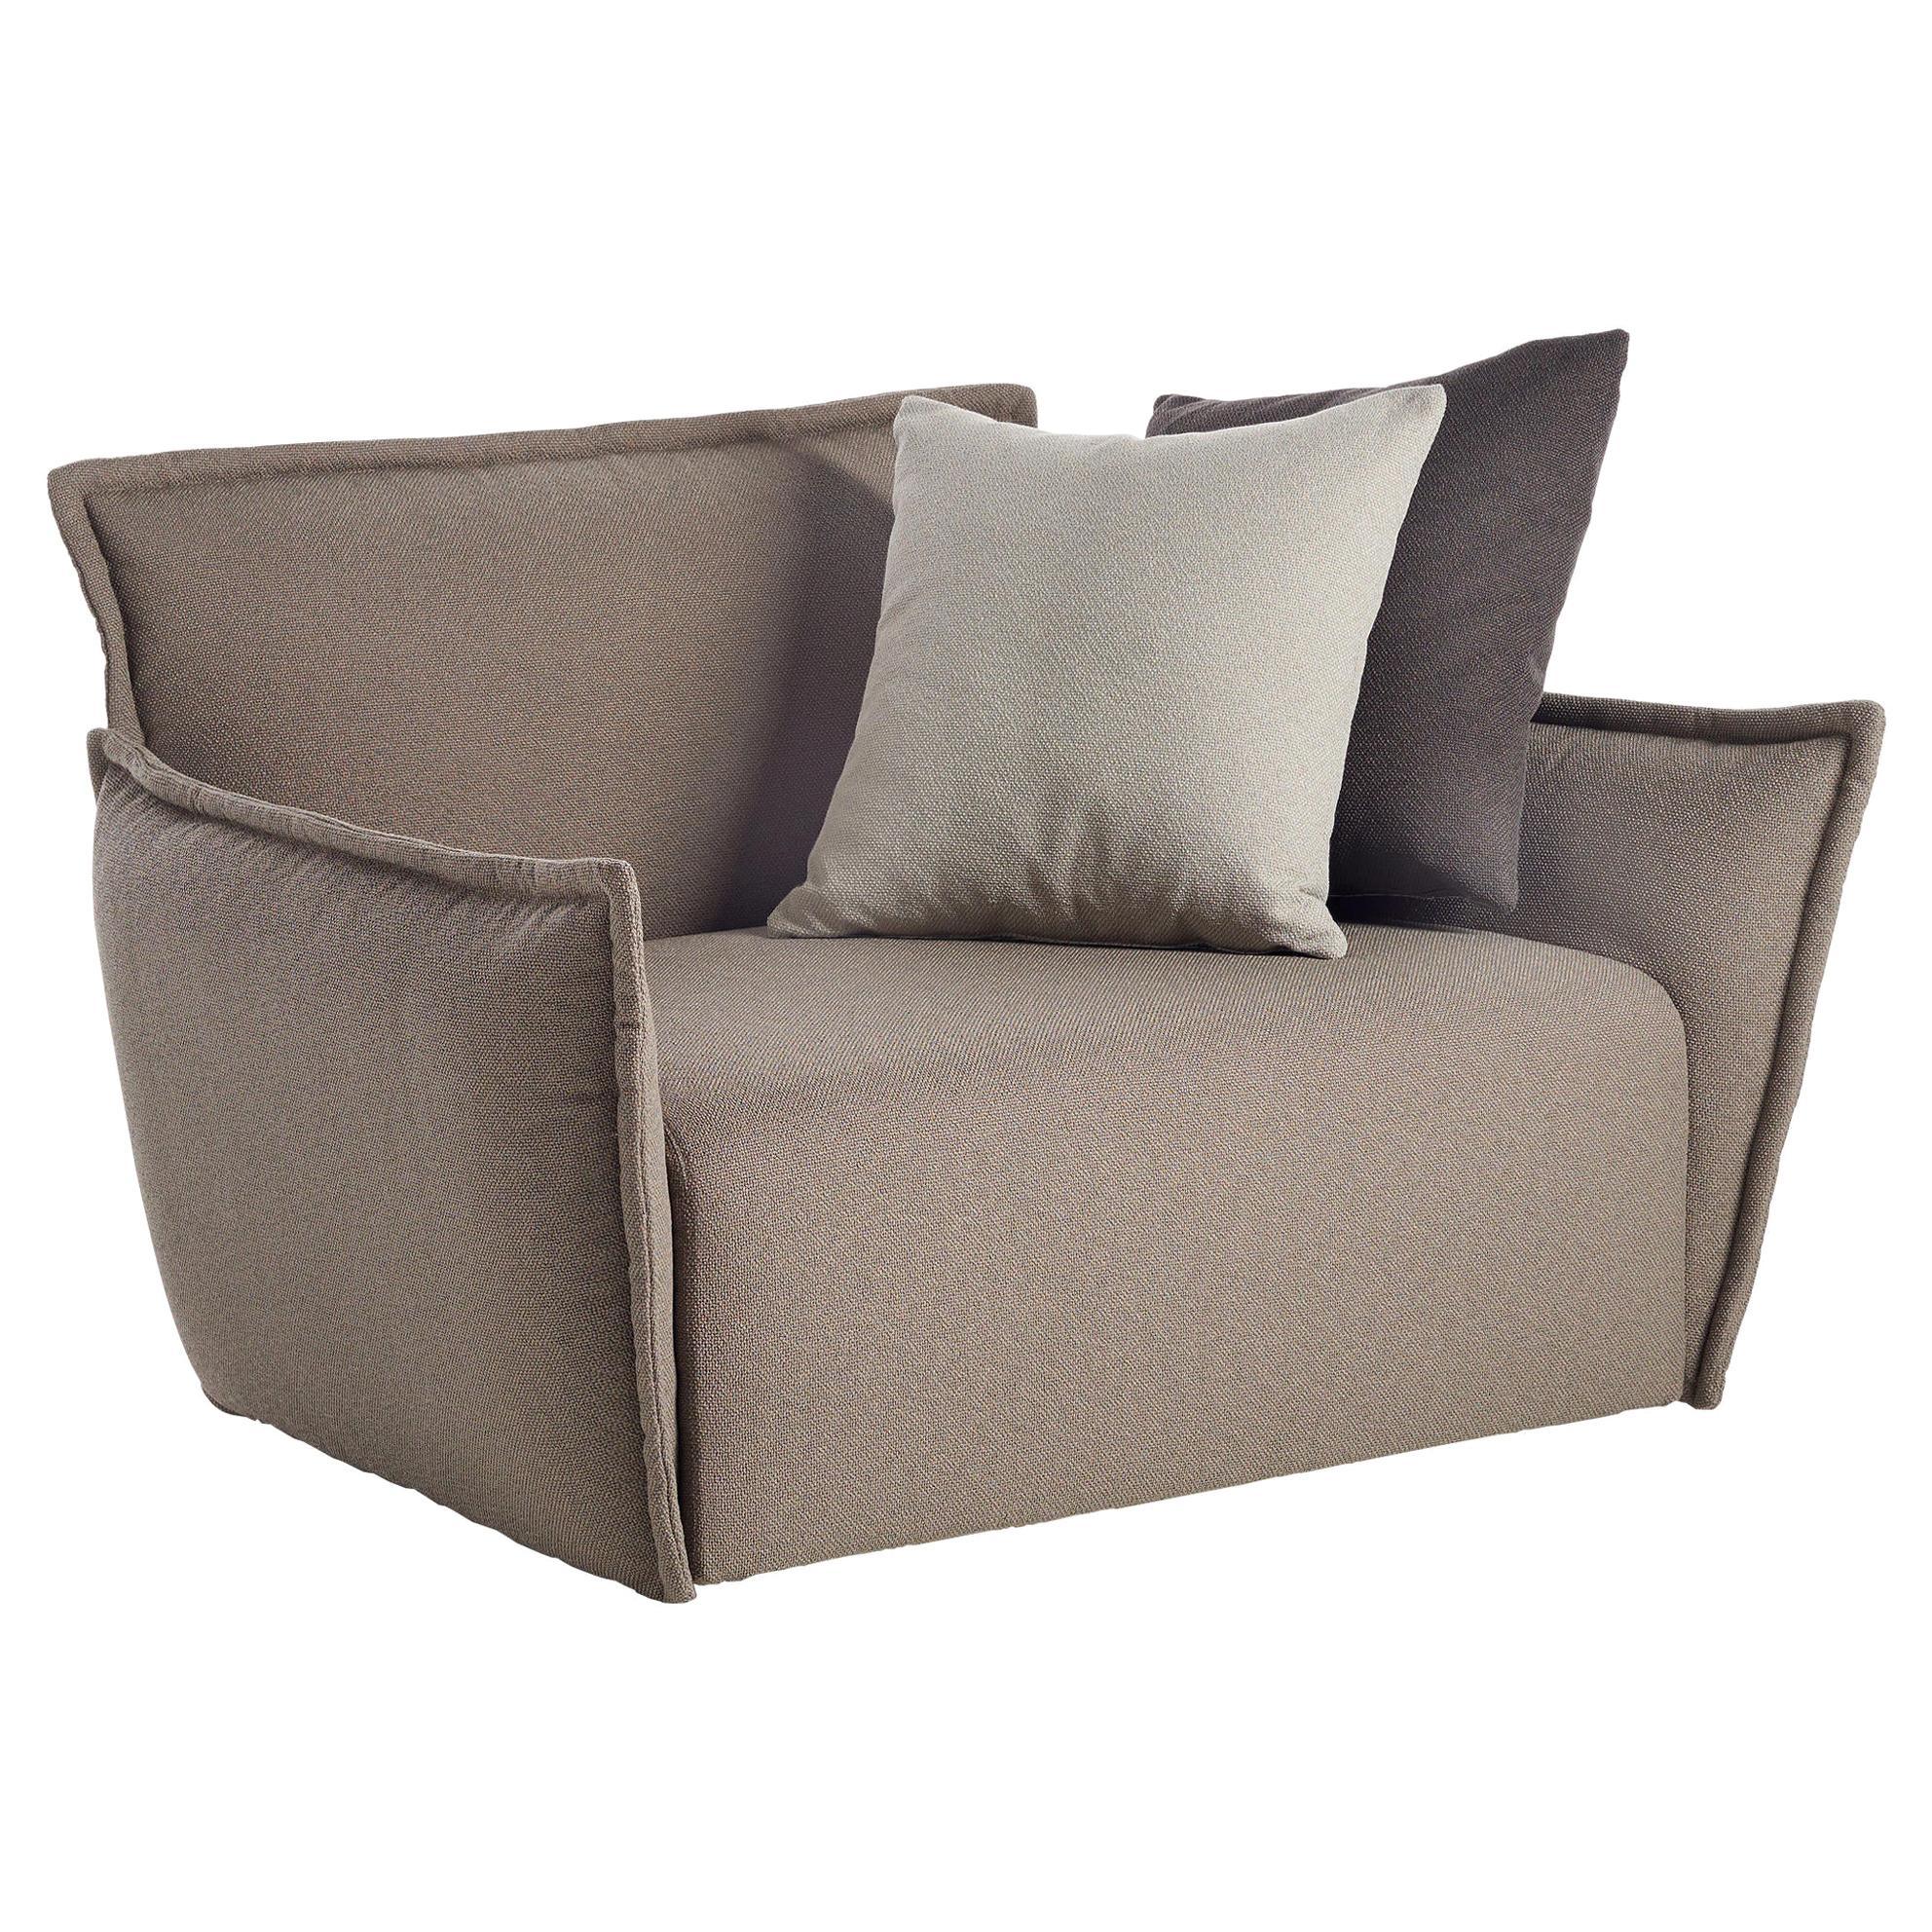 Indoor / Outdoor Potocco Purple Lounge Armchair